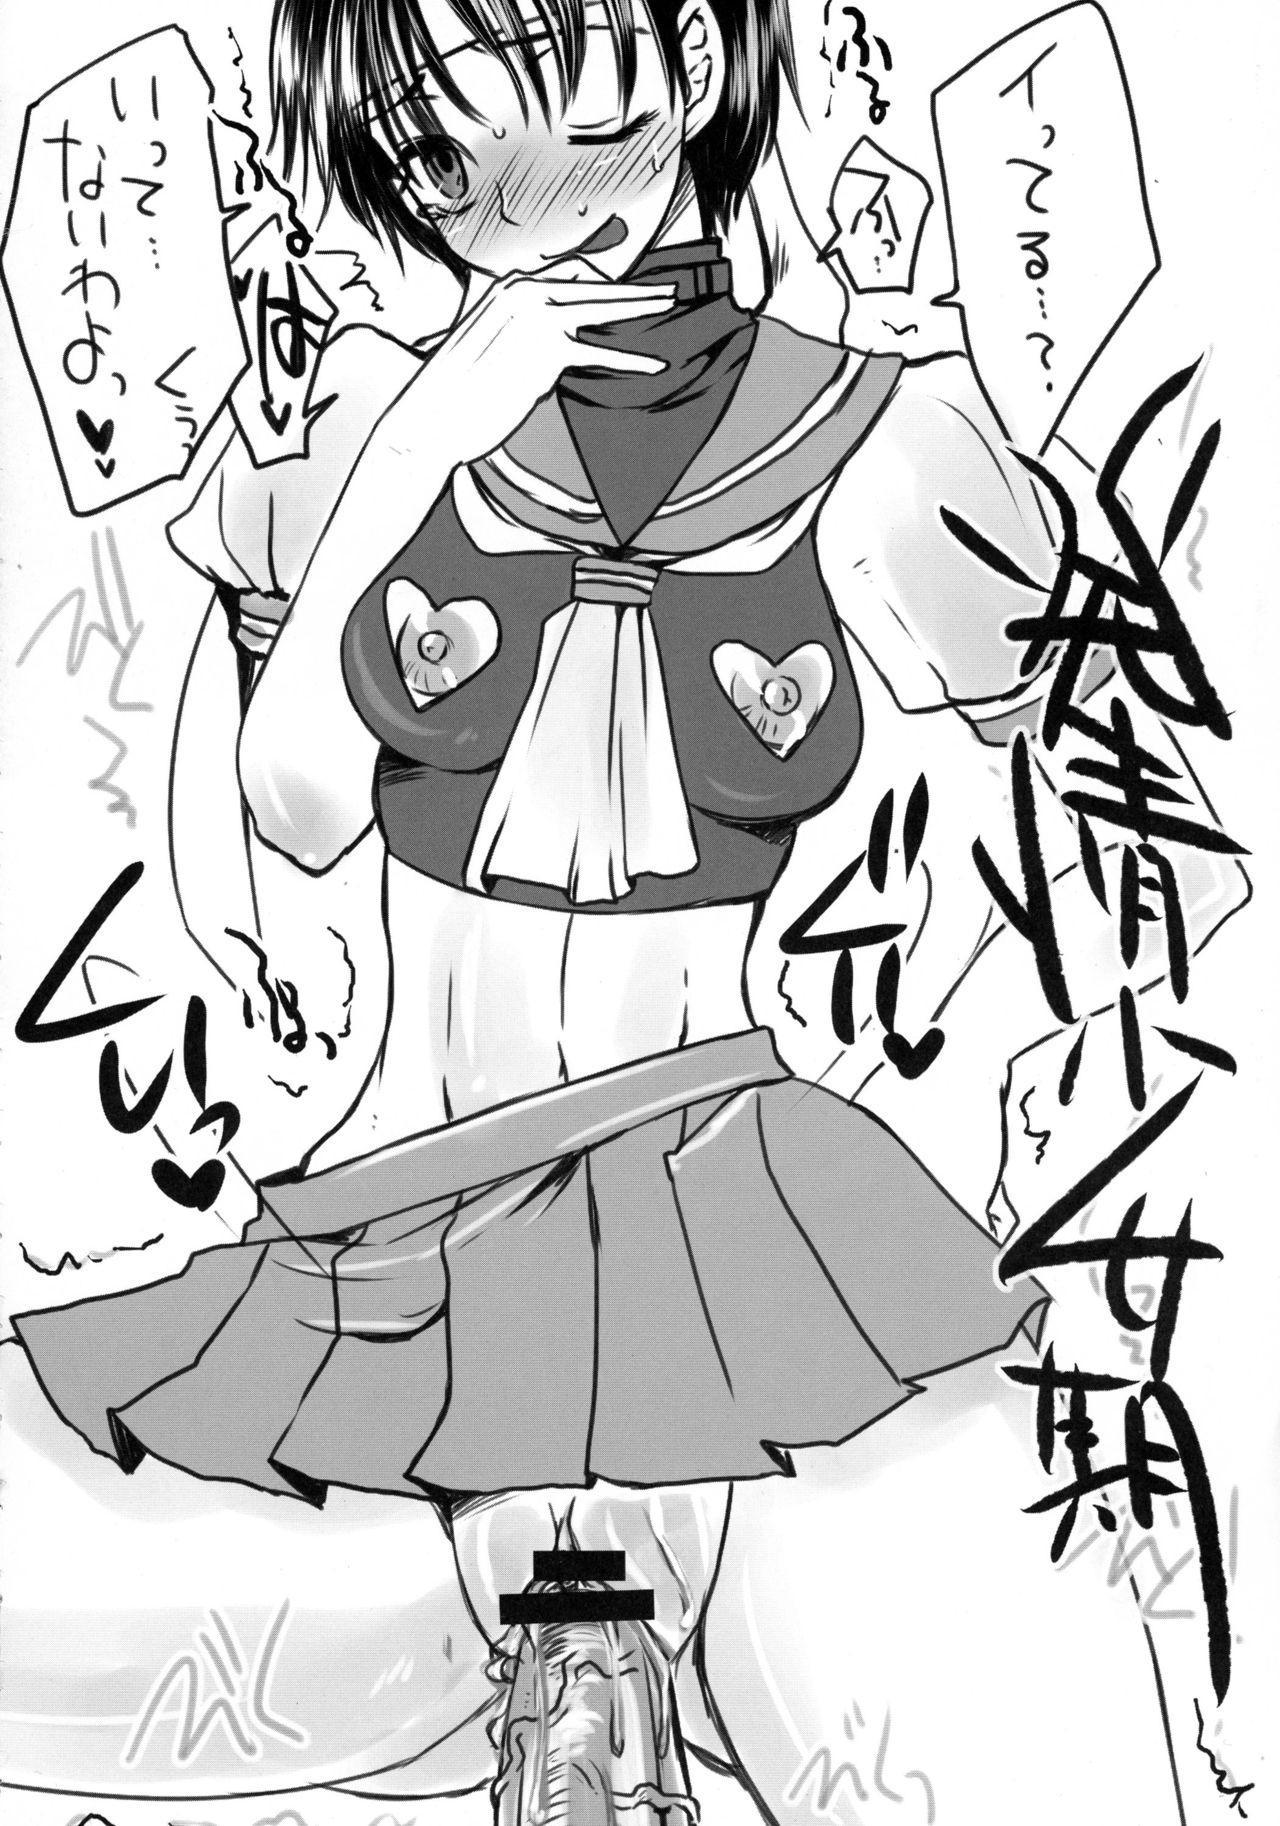 Acme-ism Onnanoko no Torotoro Acmegao Magazine 3